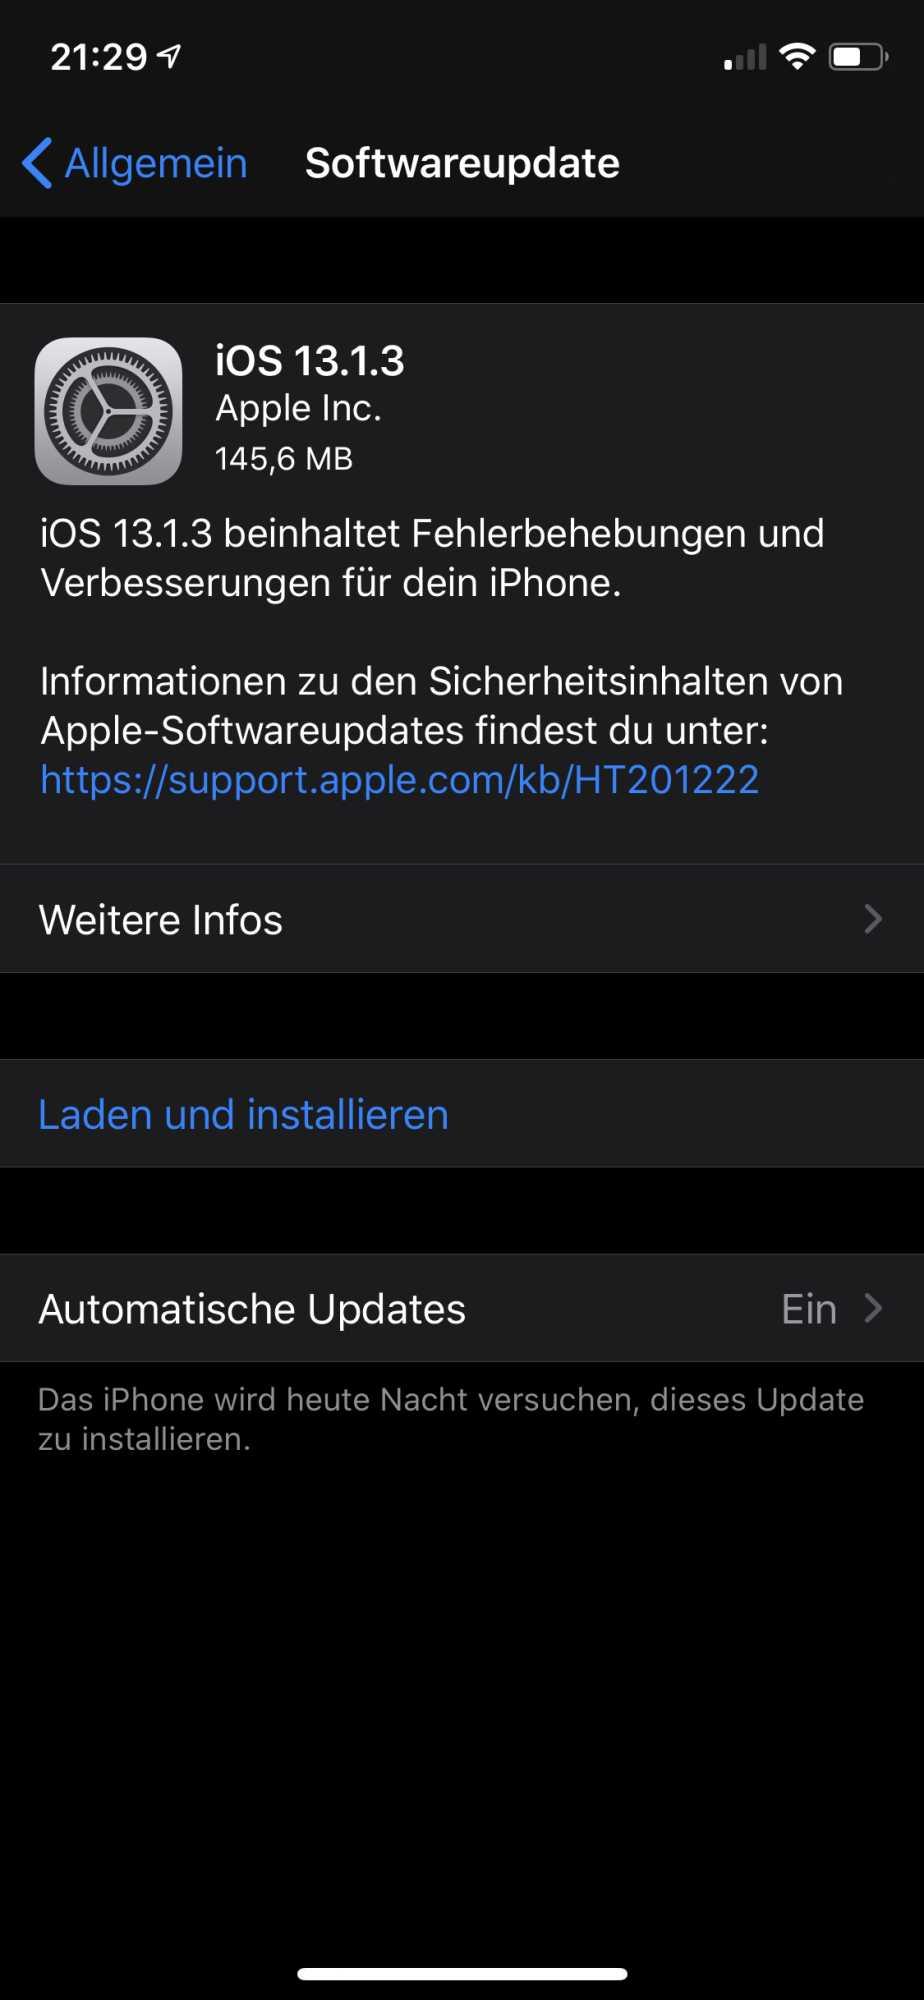 iOS 13.1.3: Wichtige Bugfixes für iPhones und iPads | Mac & i